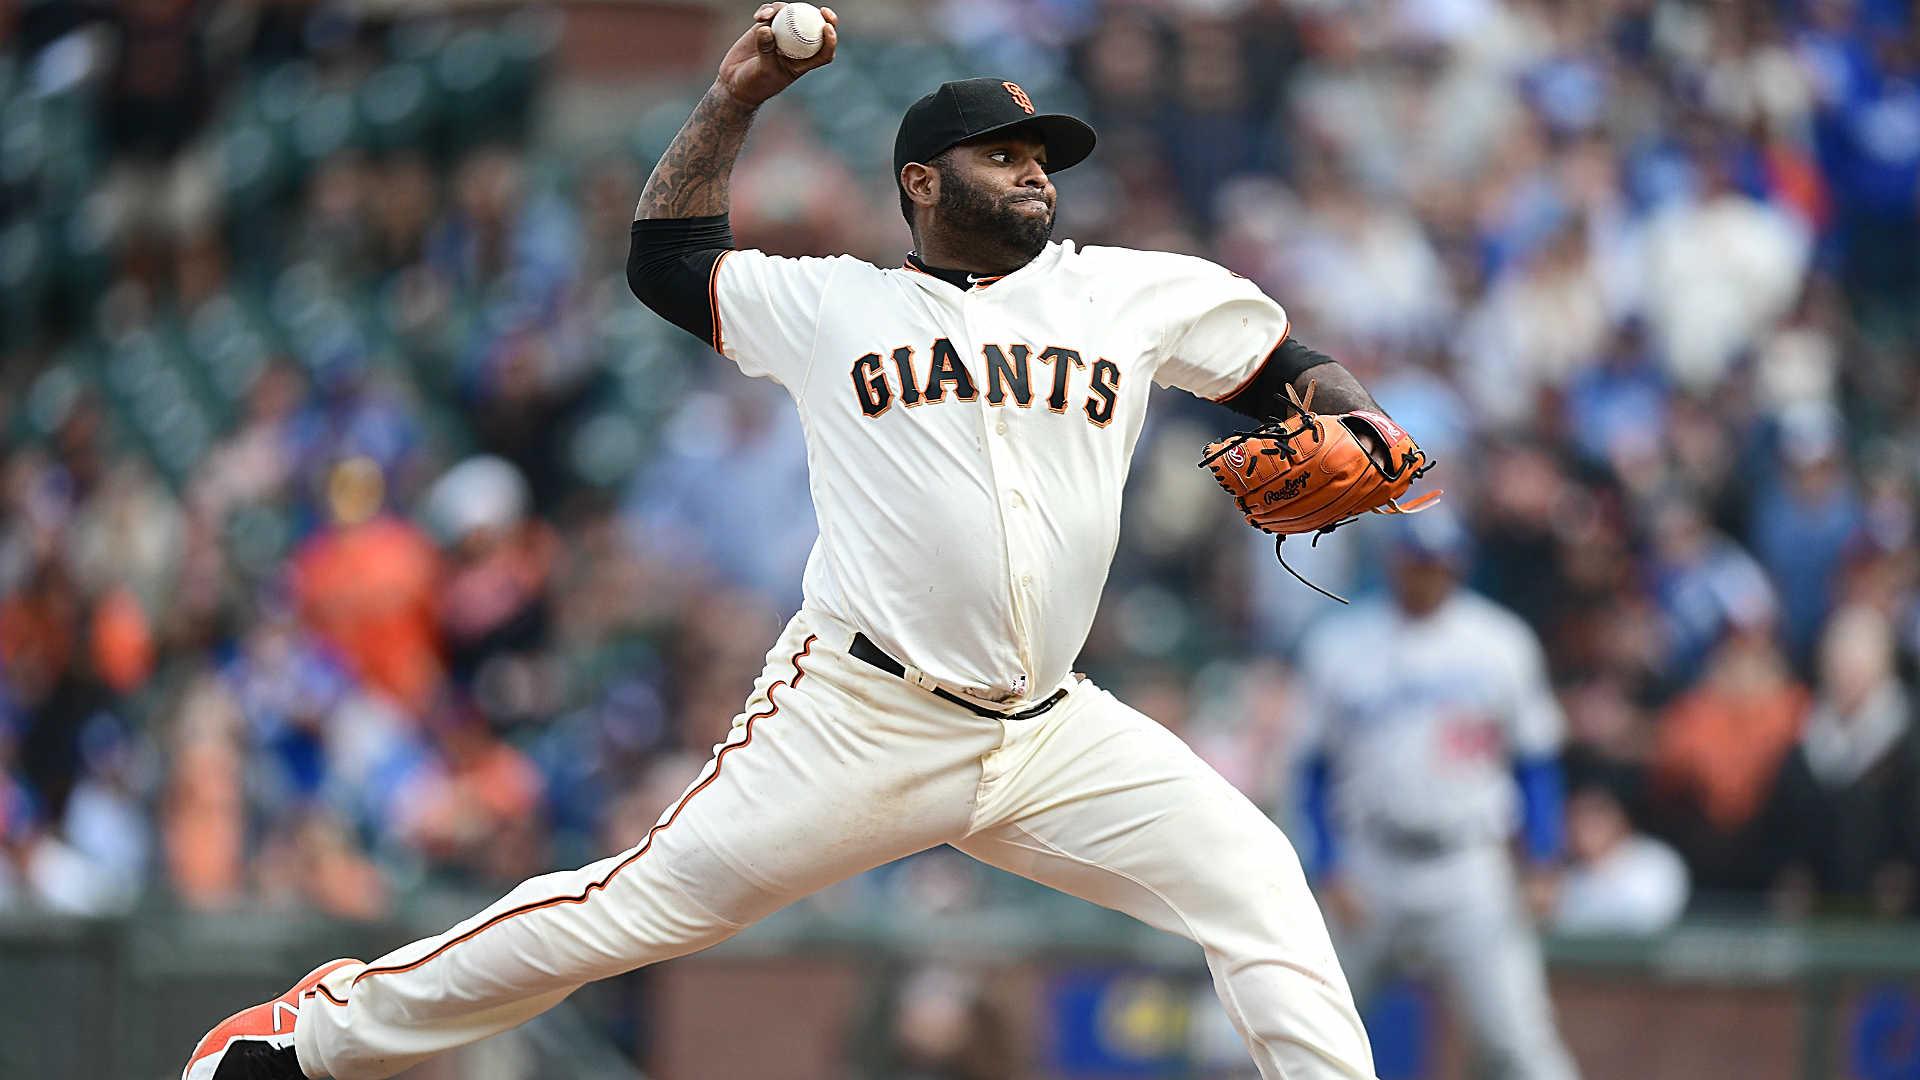 Longoria, Crawford homer as Giants slip past Dodgers